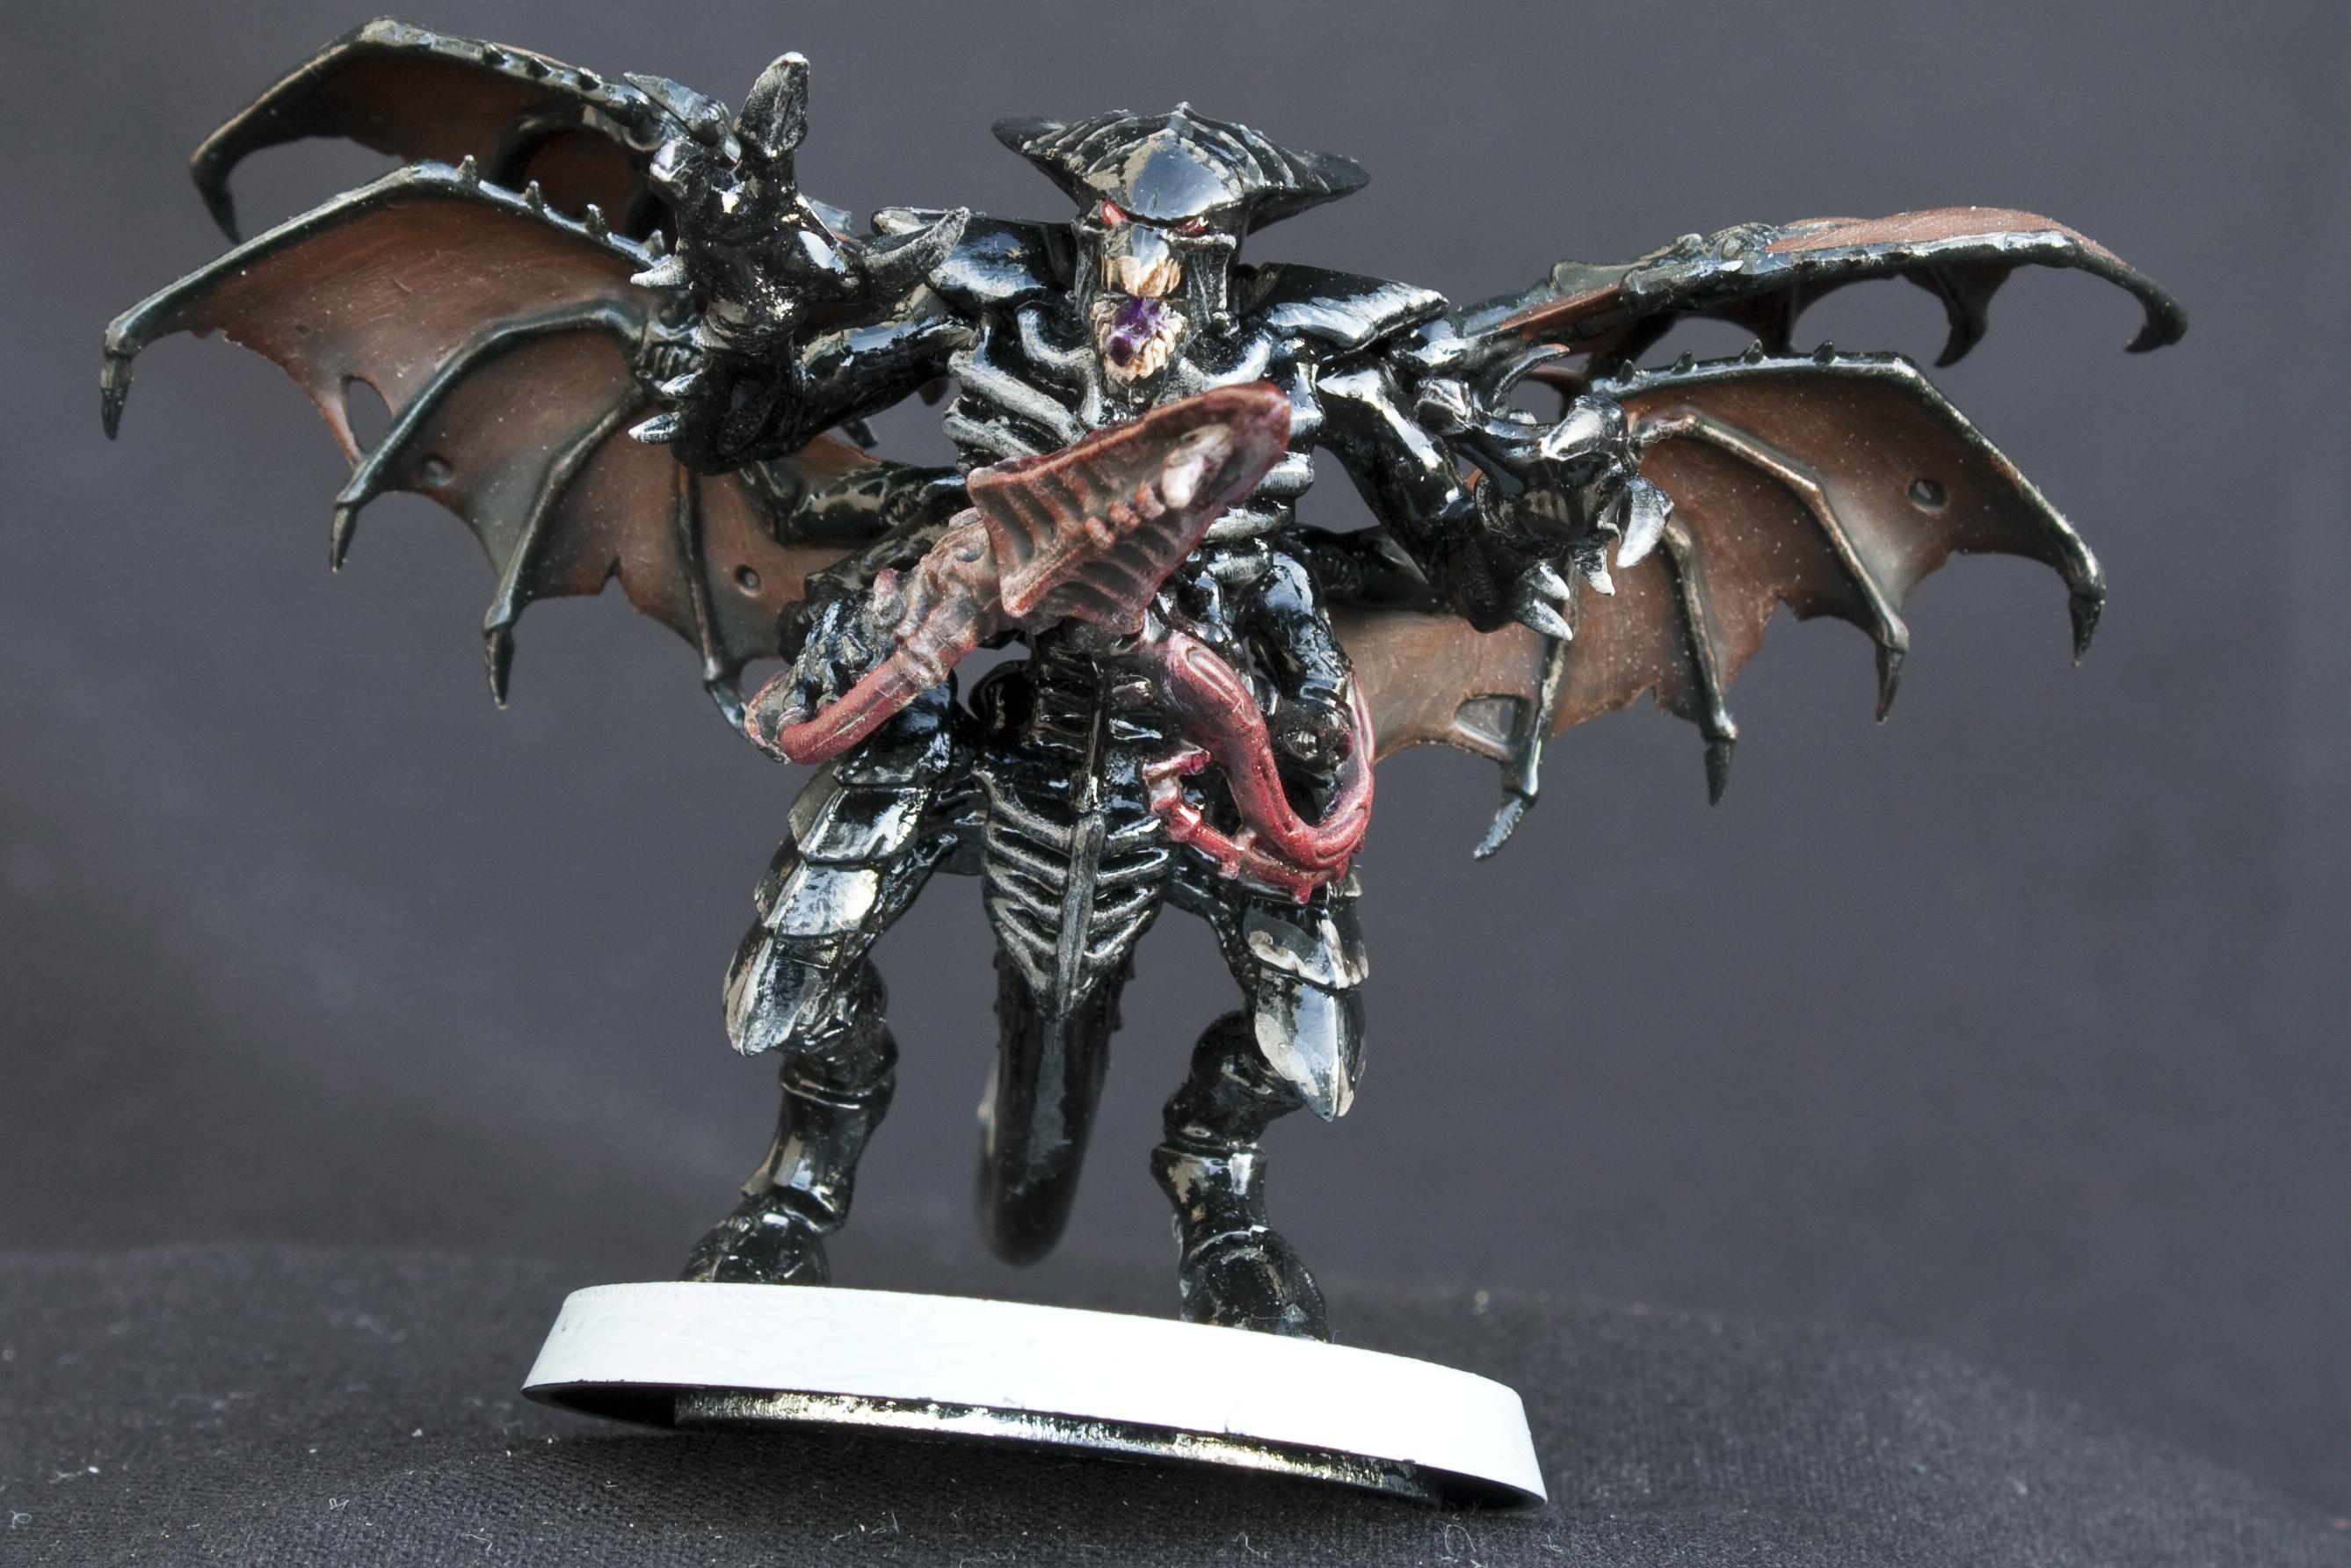 Black, Conversion, Glossy, Shrike, Shrikes, Tyranids, Warhammer 40,000, Winged